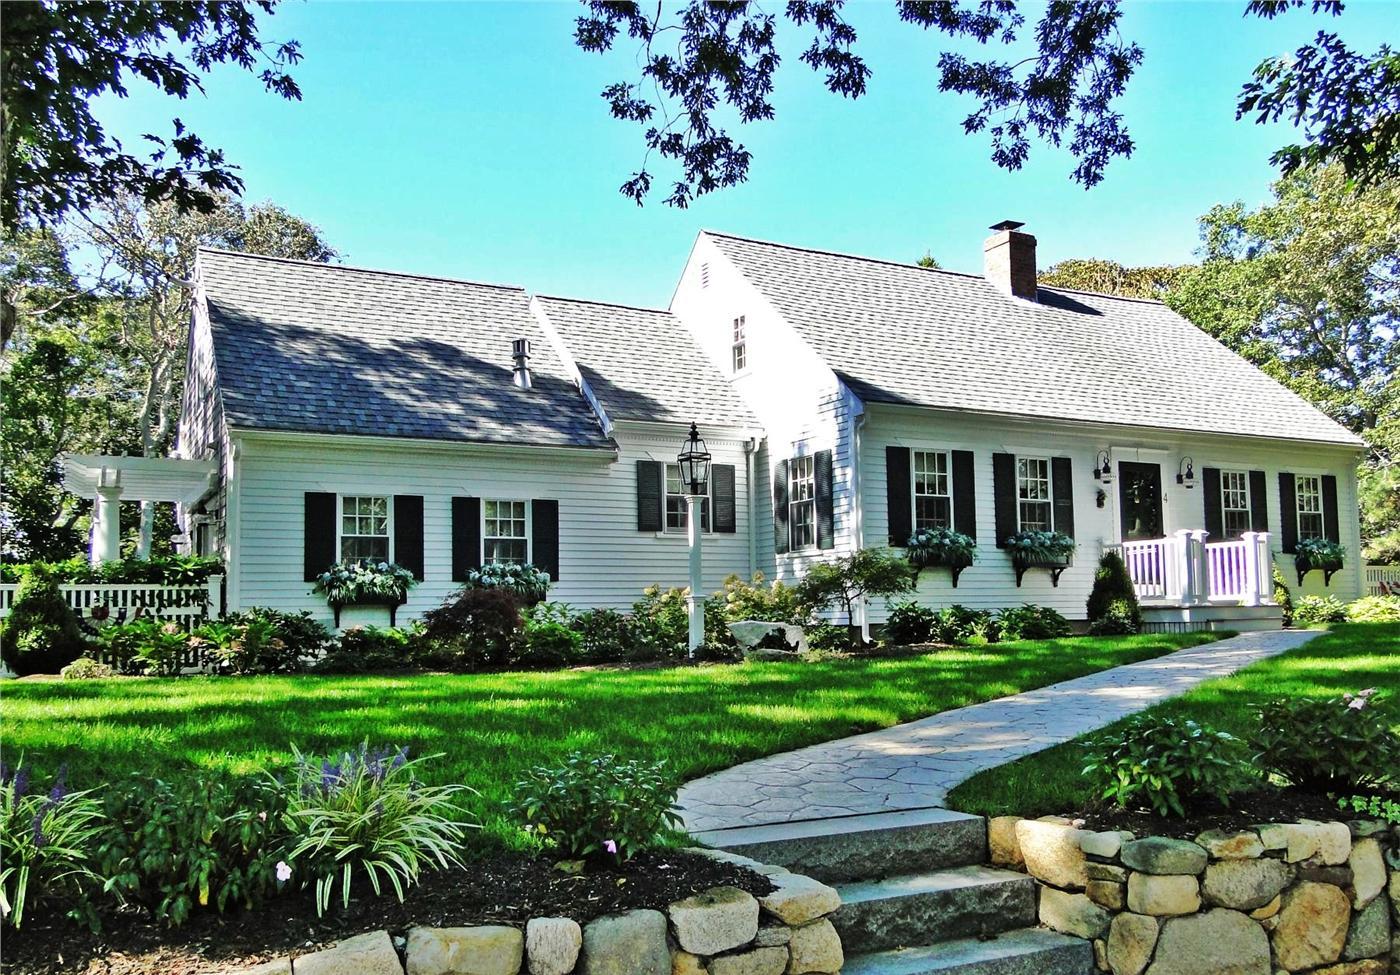 Edgartown Vacation Rental home in Marthas Vineyard MA